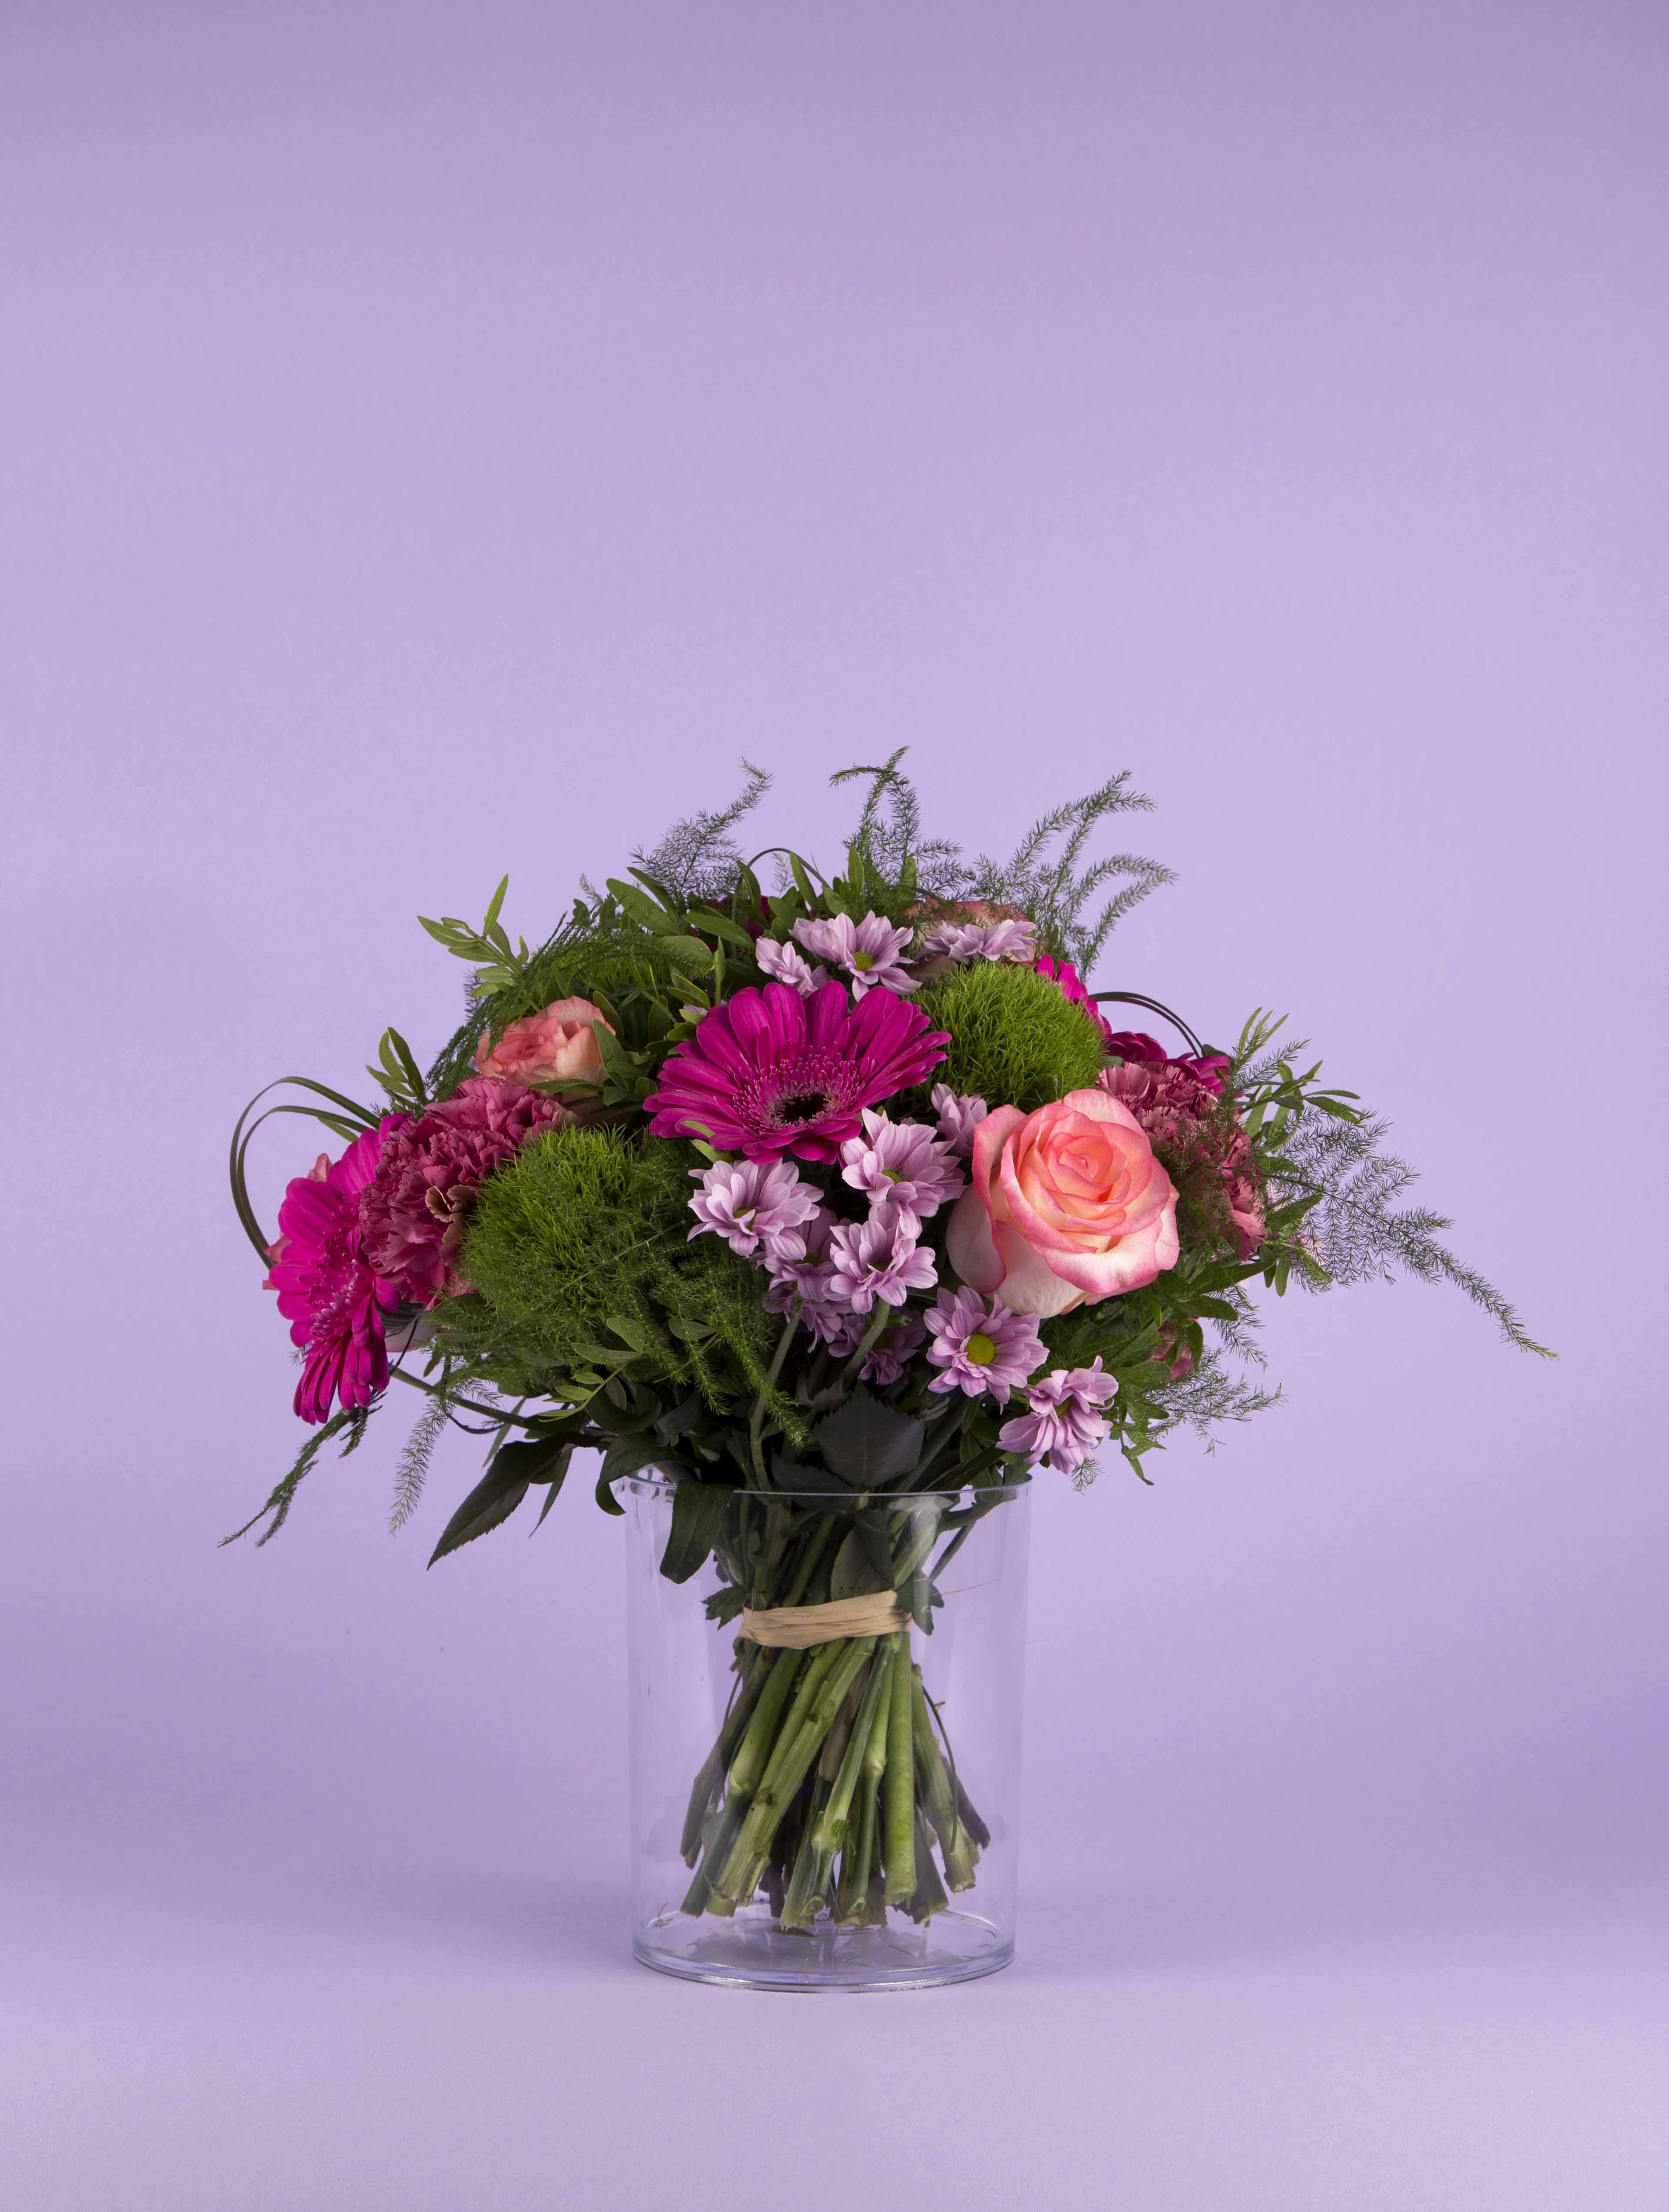 bouquet de fleurs camaieu